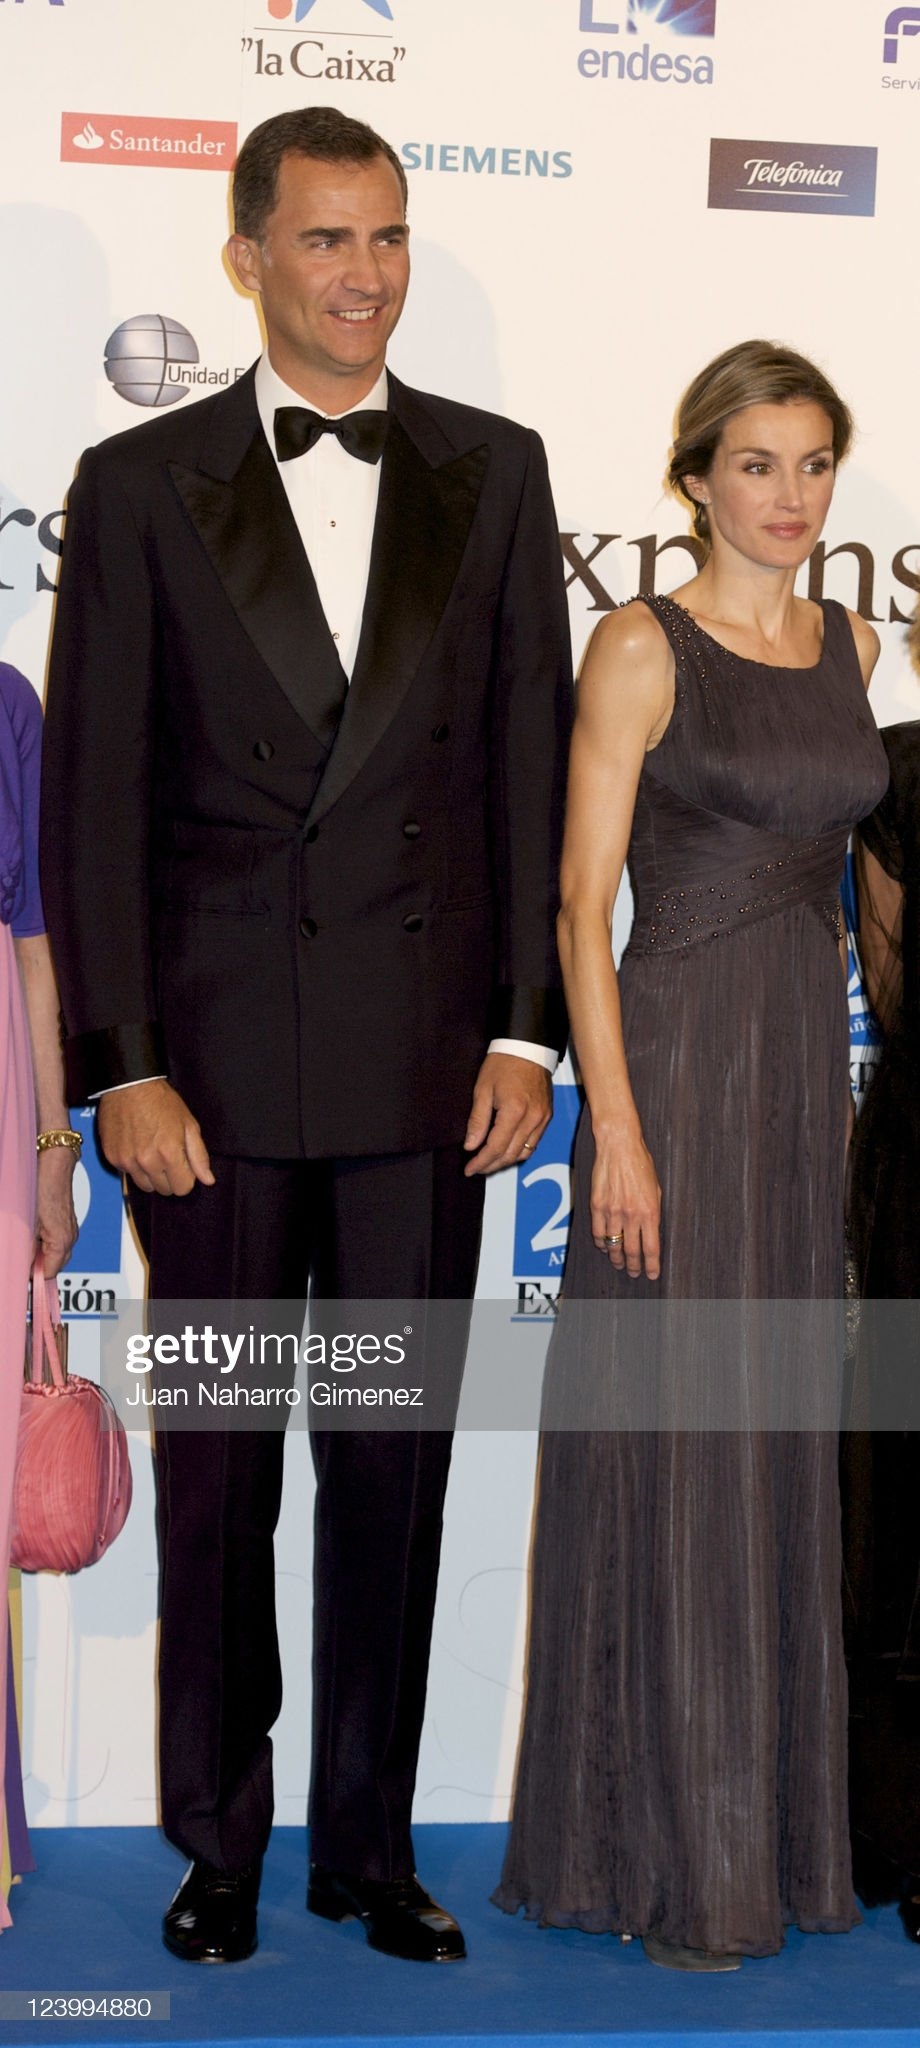 Вечерние наряды Королевы Летиции Prince Felipe and Princess Letizia Attend the XXV Anniversary of 'Expansion' Newspaper : News Photo